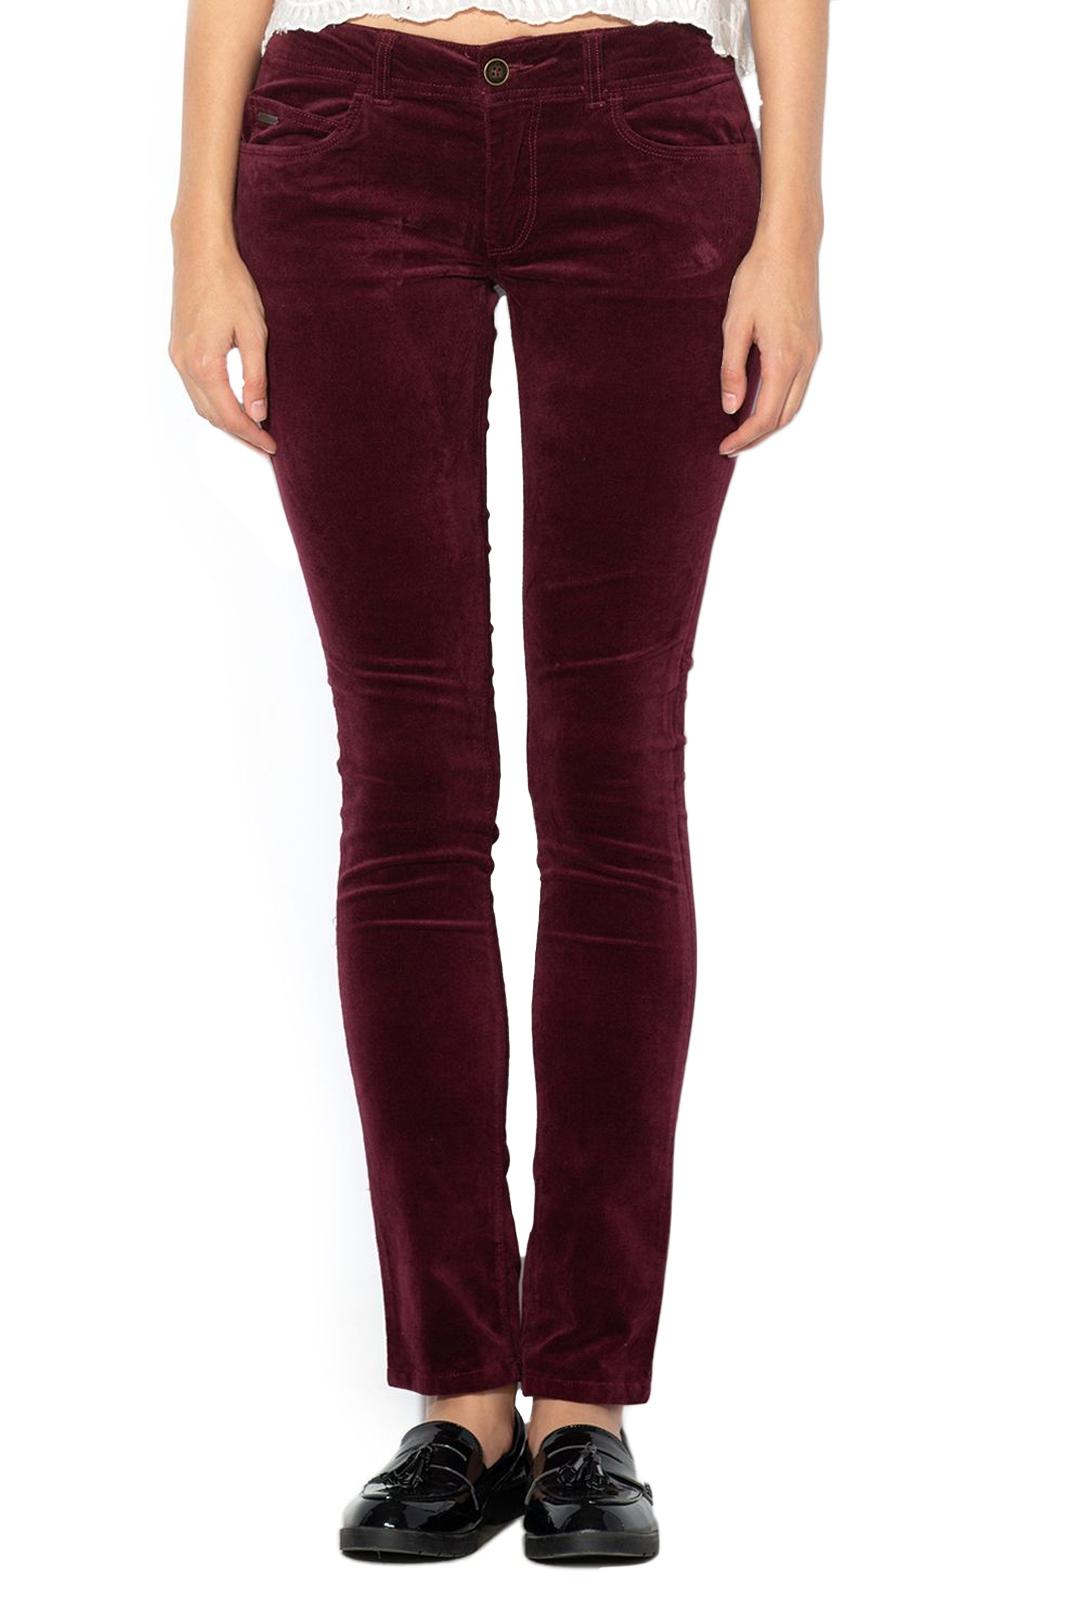 Jeans   Pepe jeans PL210857 joanna 299